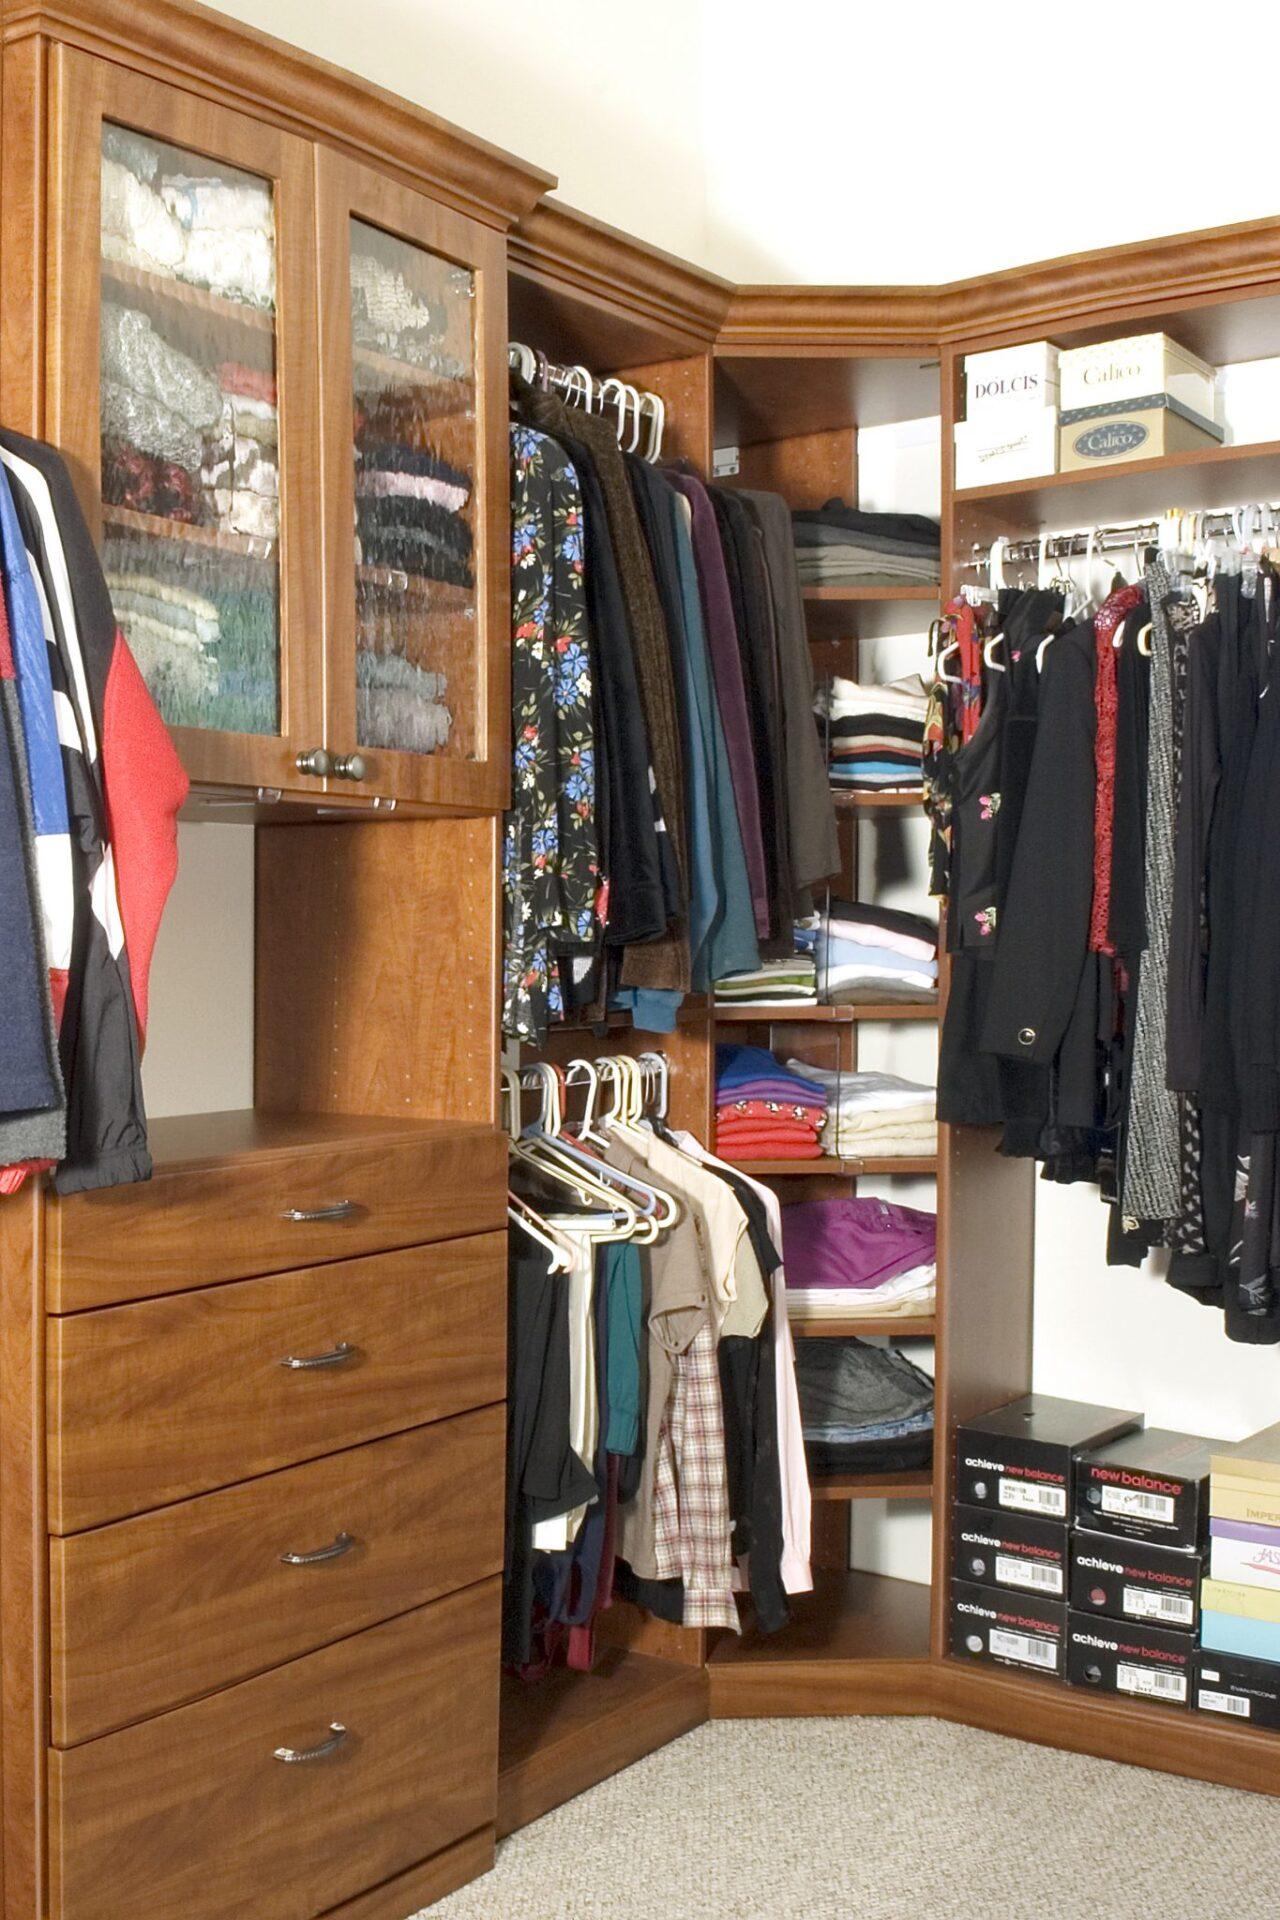 Closet Redesign Experts In Denver. Walk In Closet, Custom Closet, Small  Space Experts